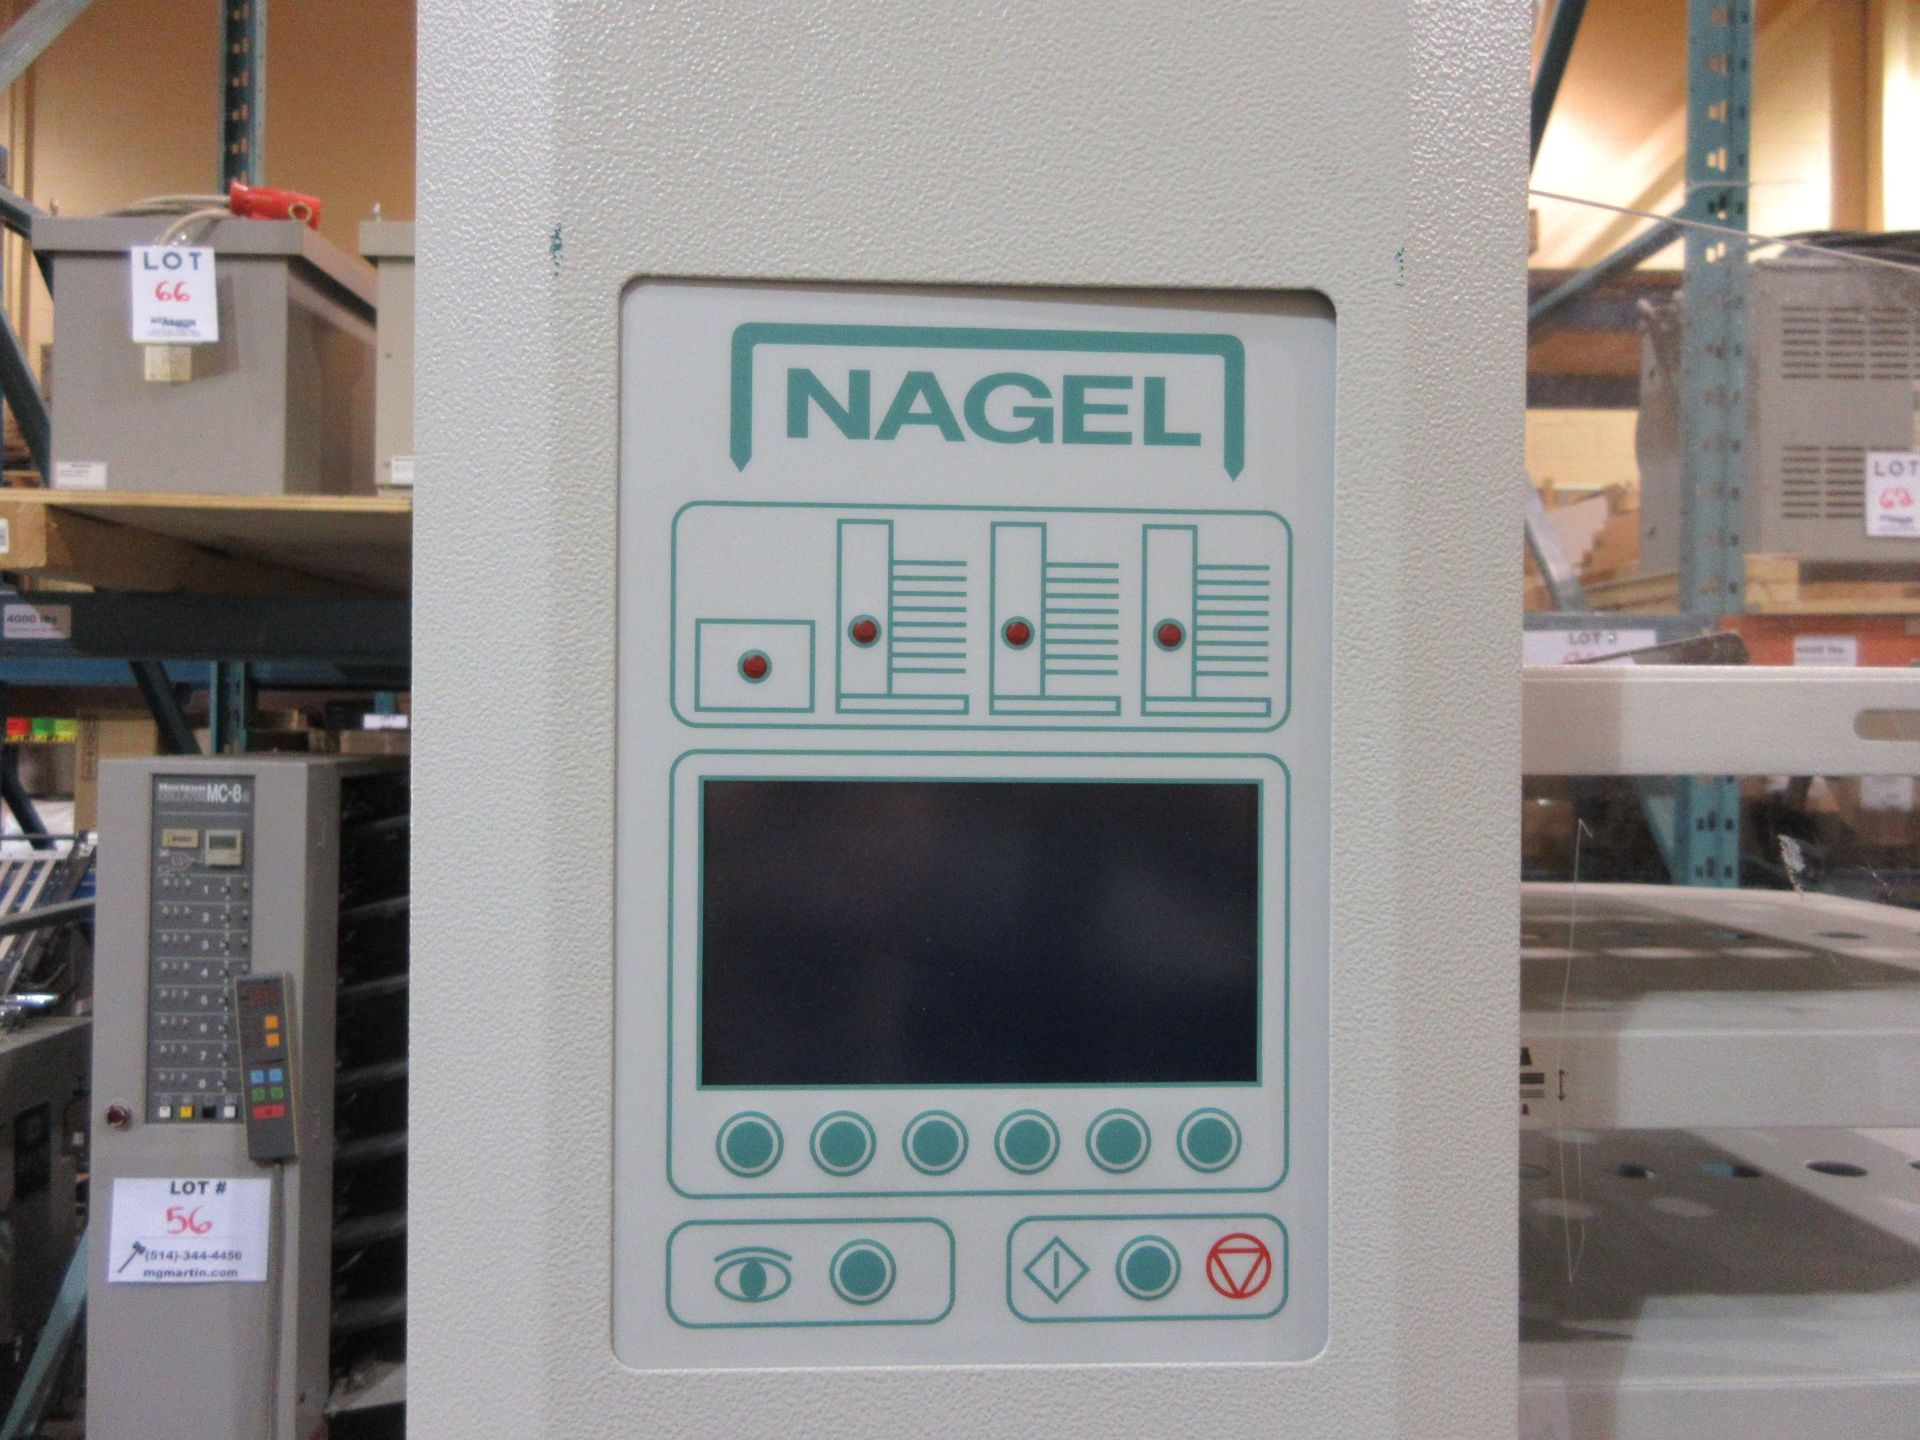 Lot 51 - NAGEL collator (mod: S8) 230V, 50/60hz, 5H (AS IS)